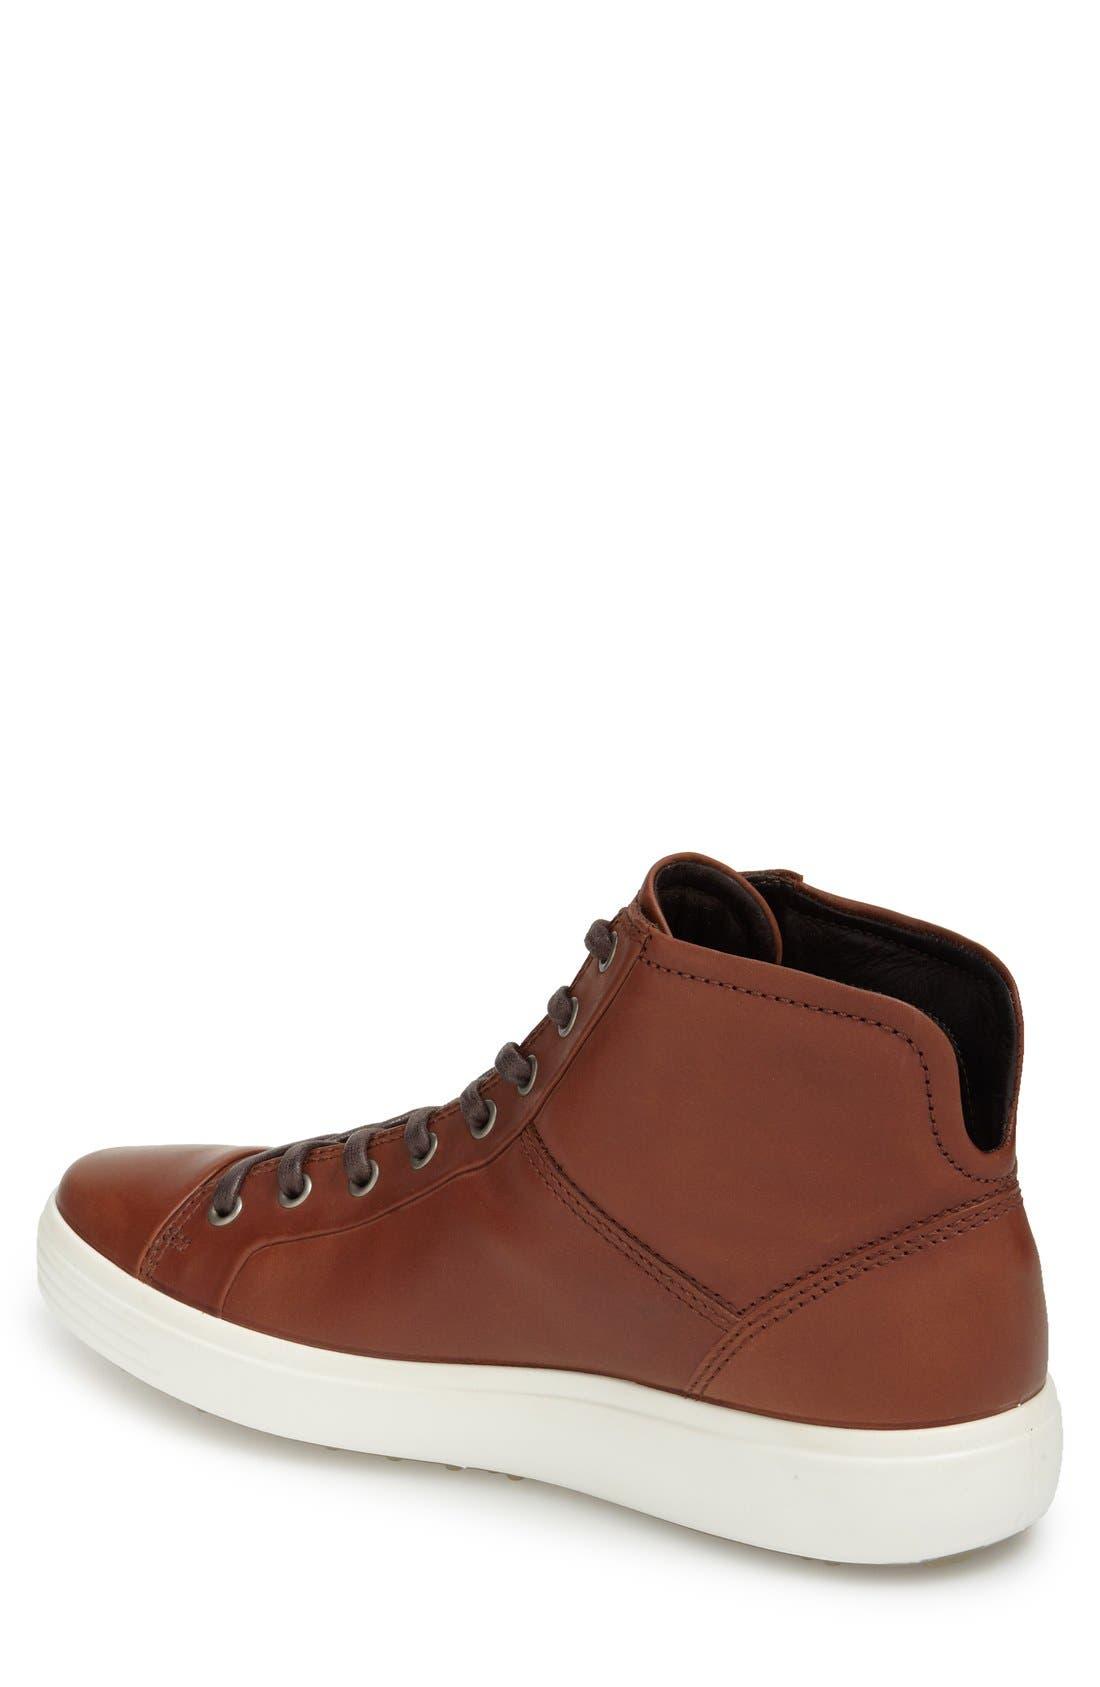 'Soft 7' High Top Sneaker,                             Alternate thumbnail 6, color,